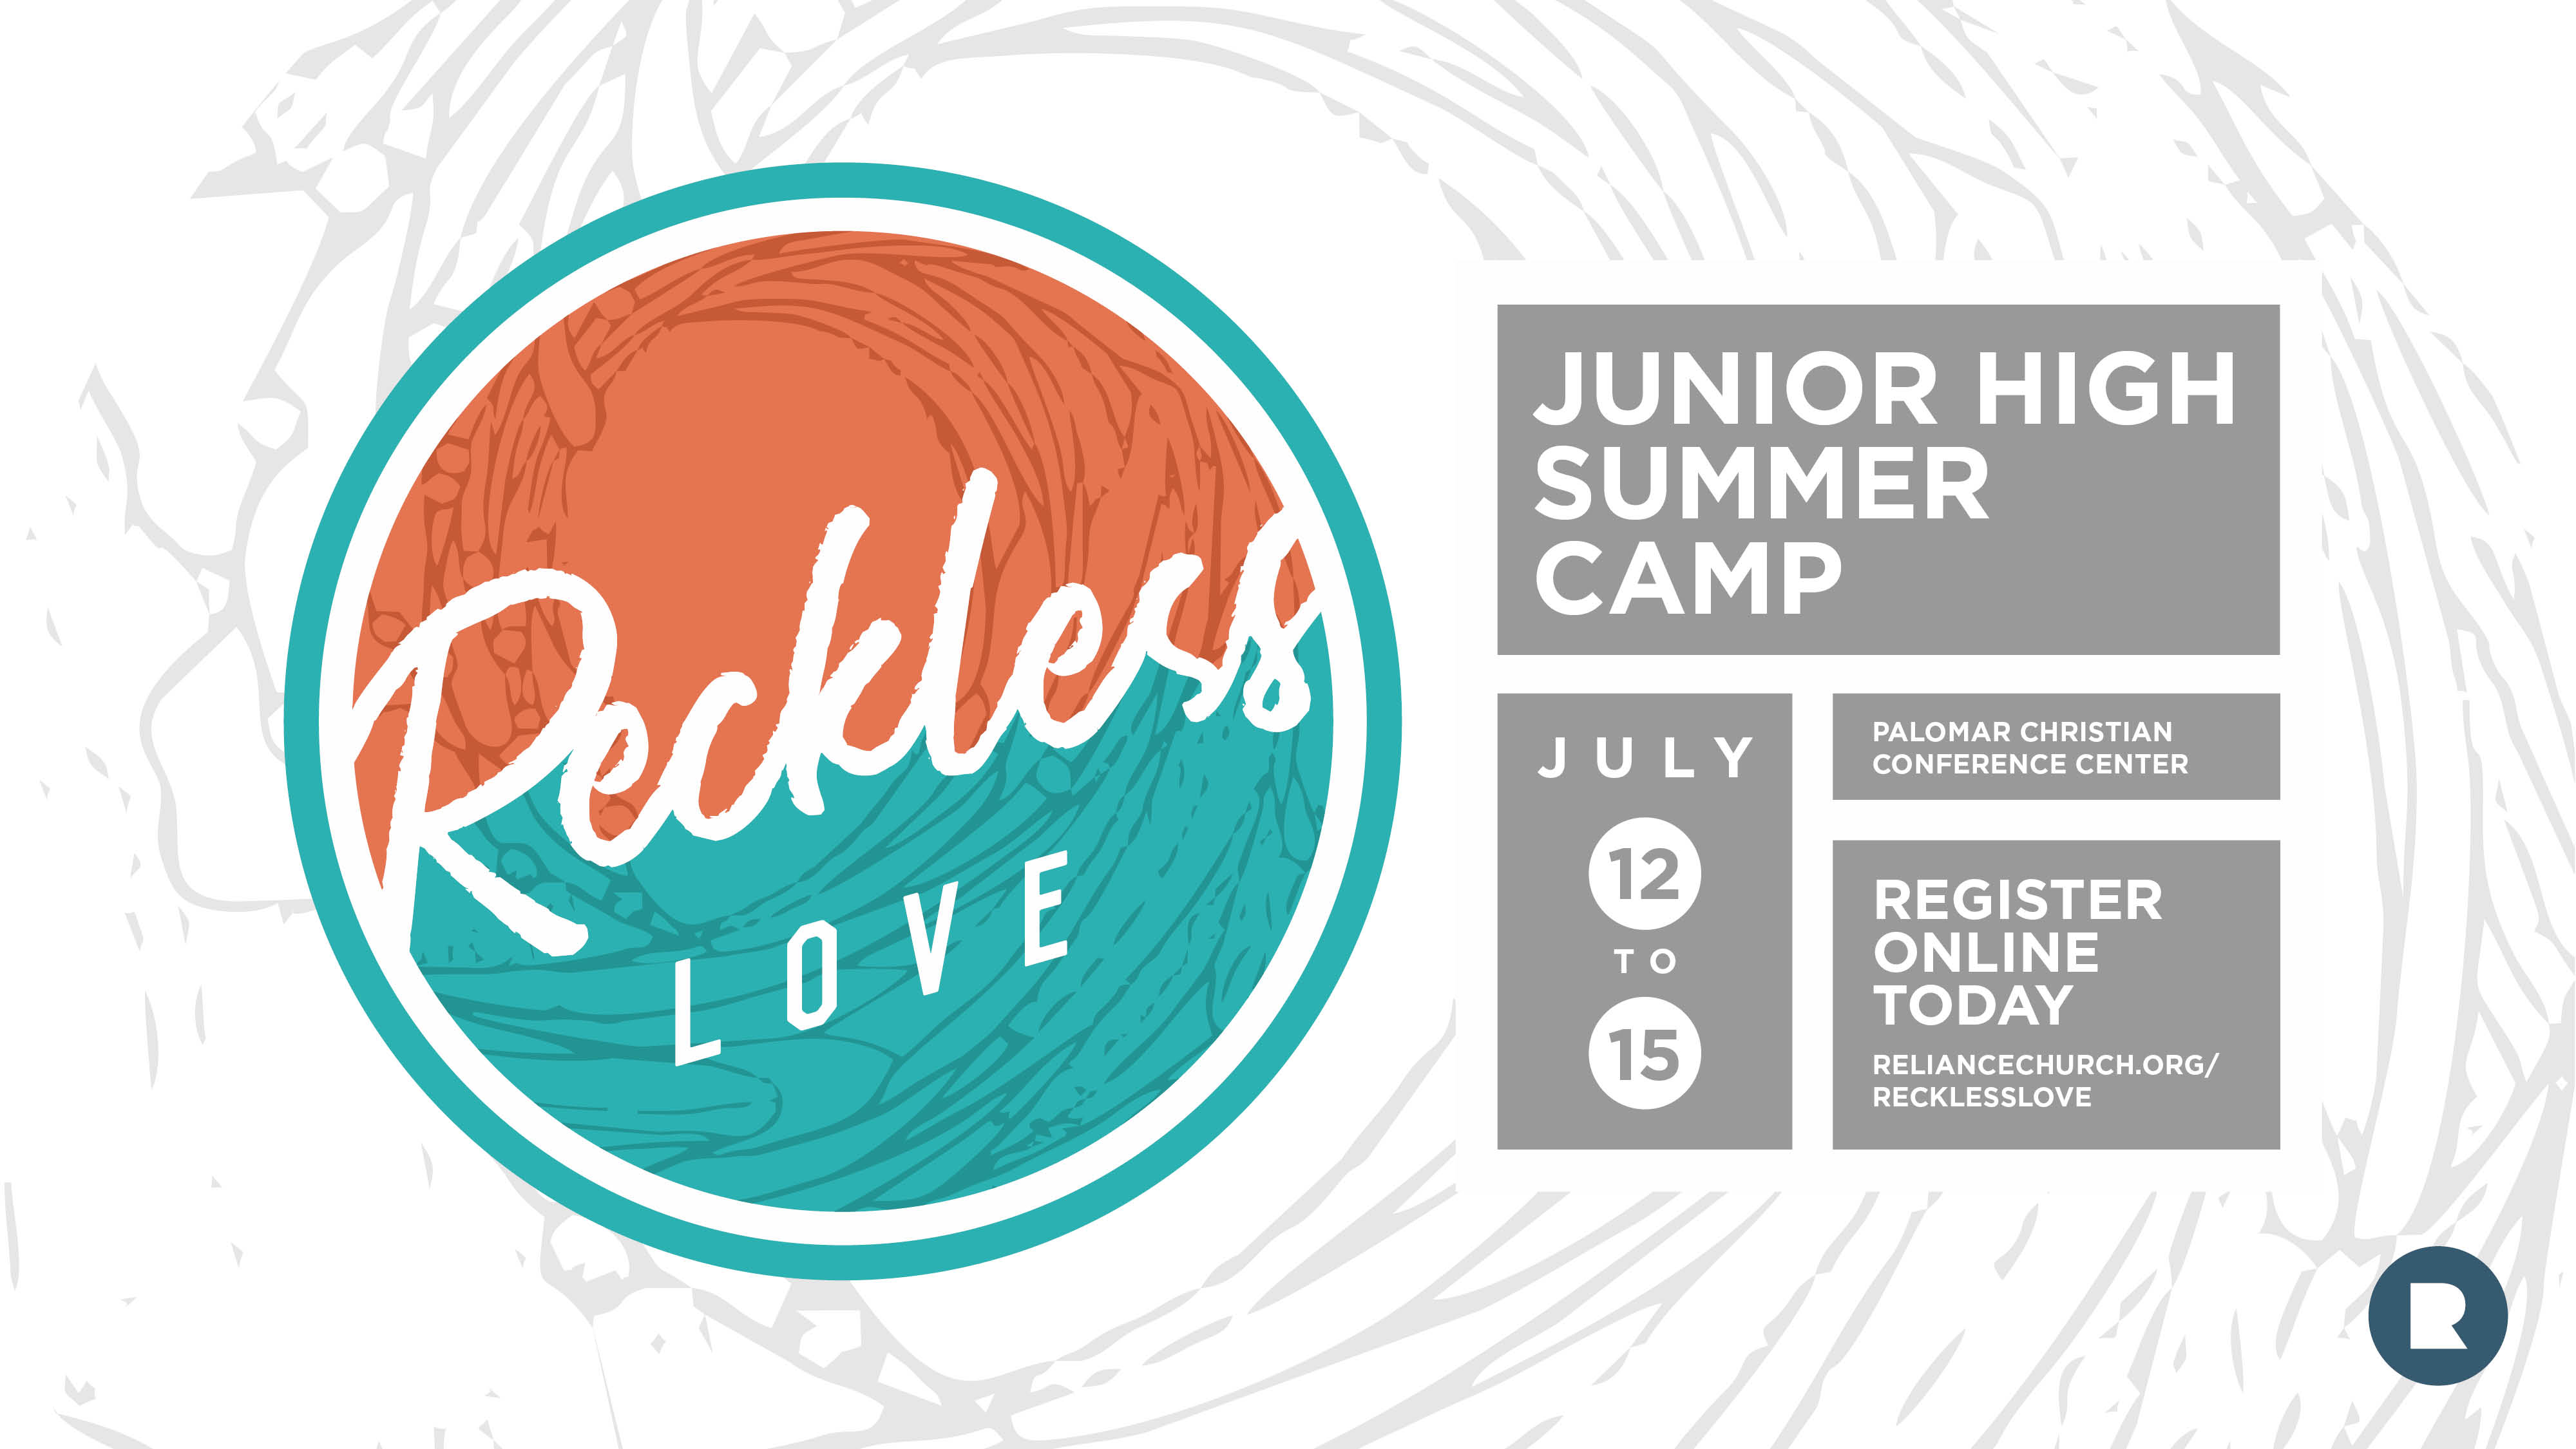 Reliance_JrHigh_SummerCamp_SlideDraft_03